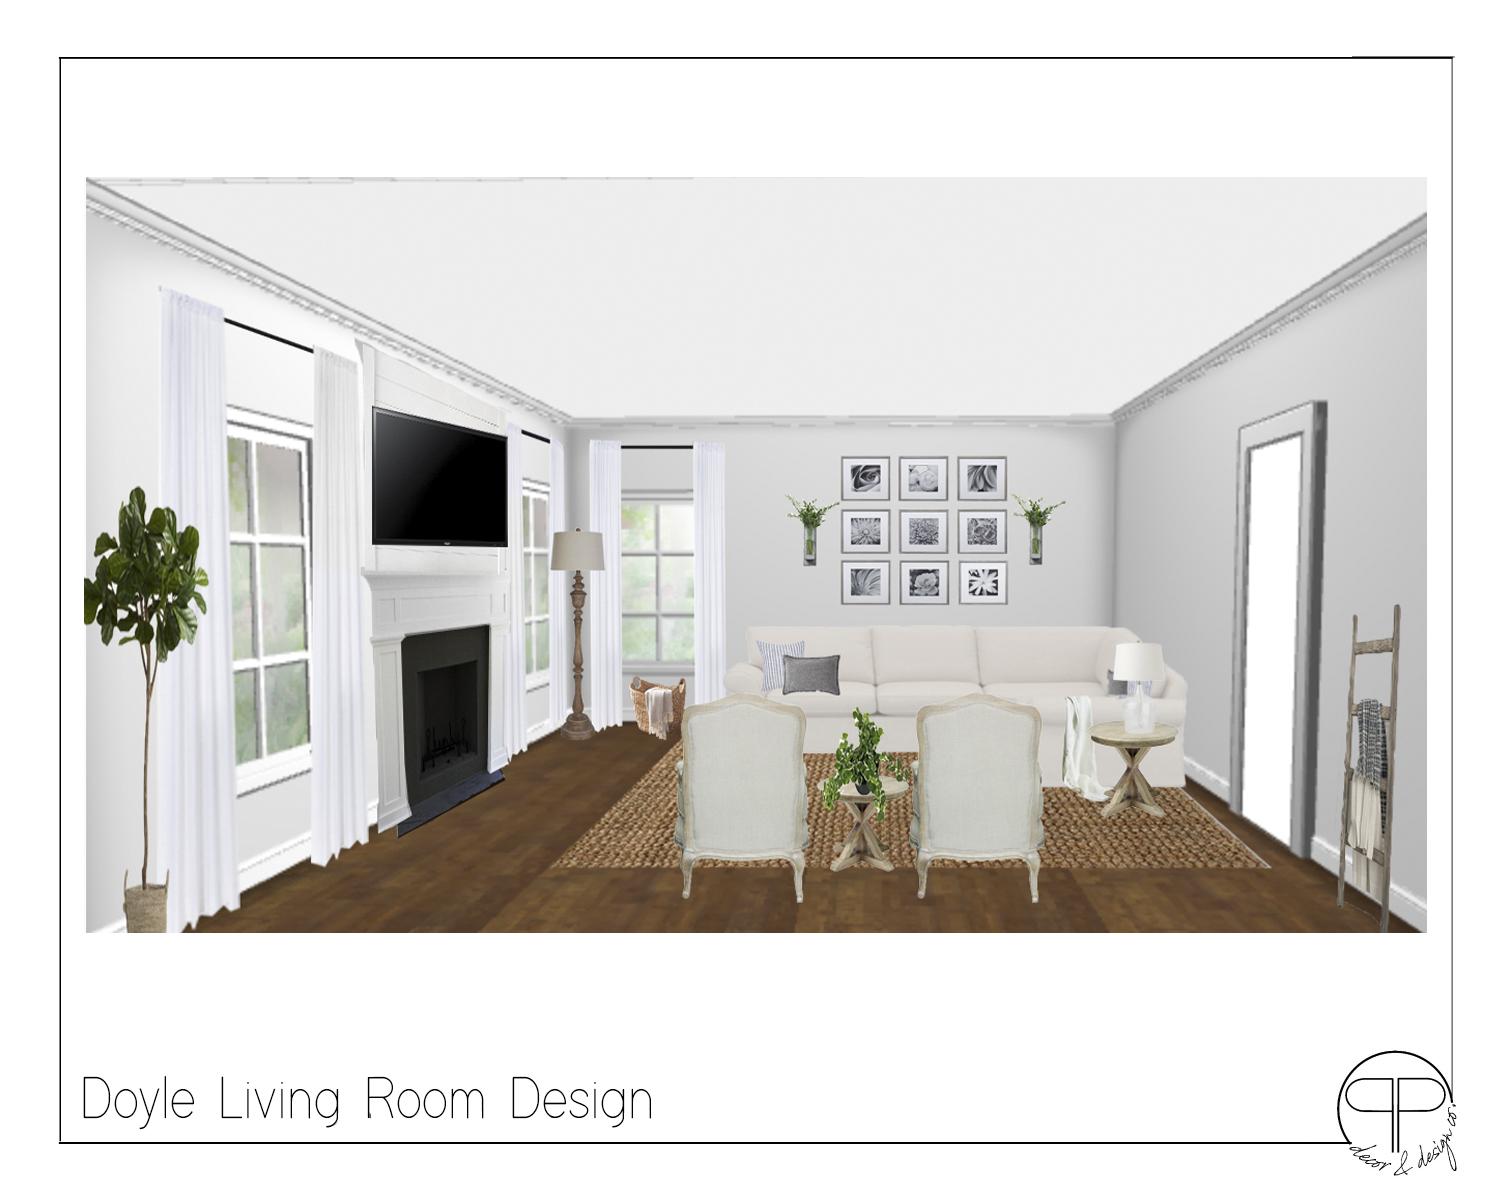 Doyle_Living_Room_Design-2.jpg